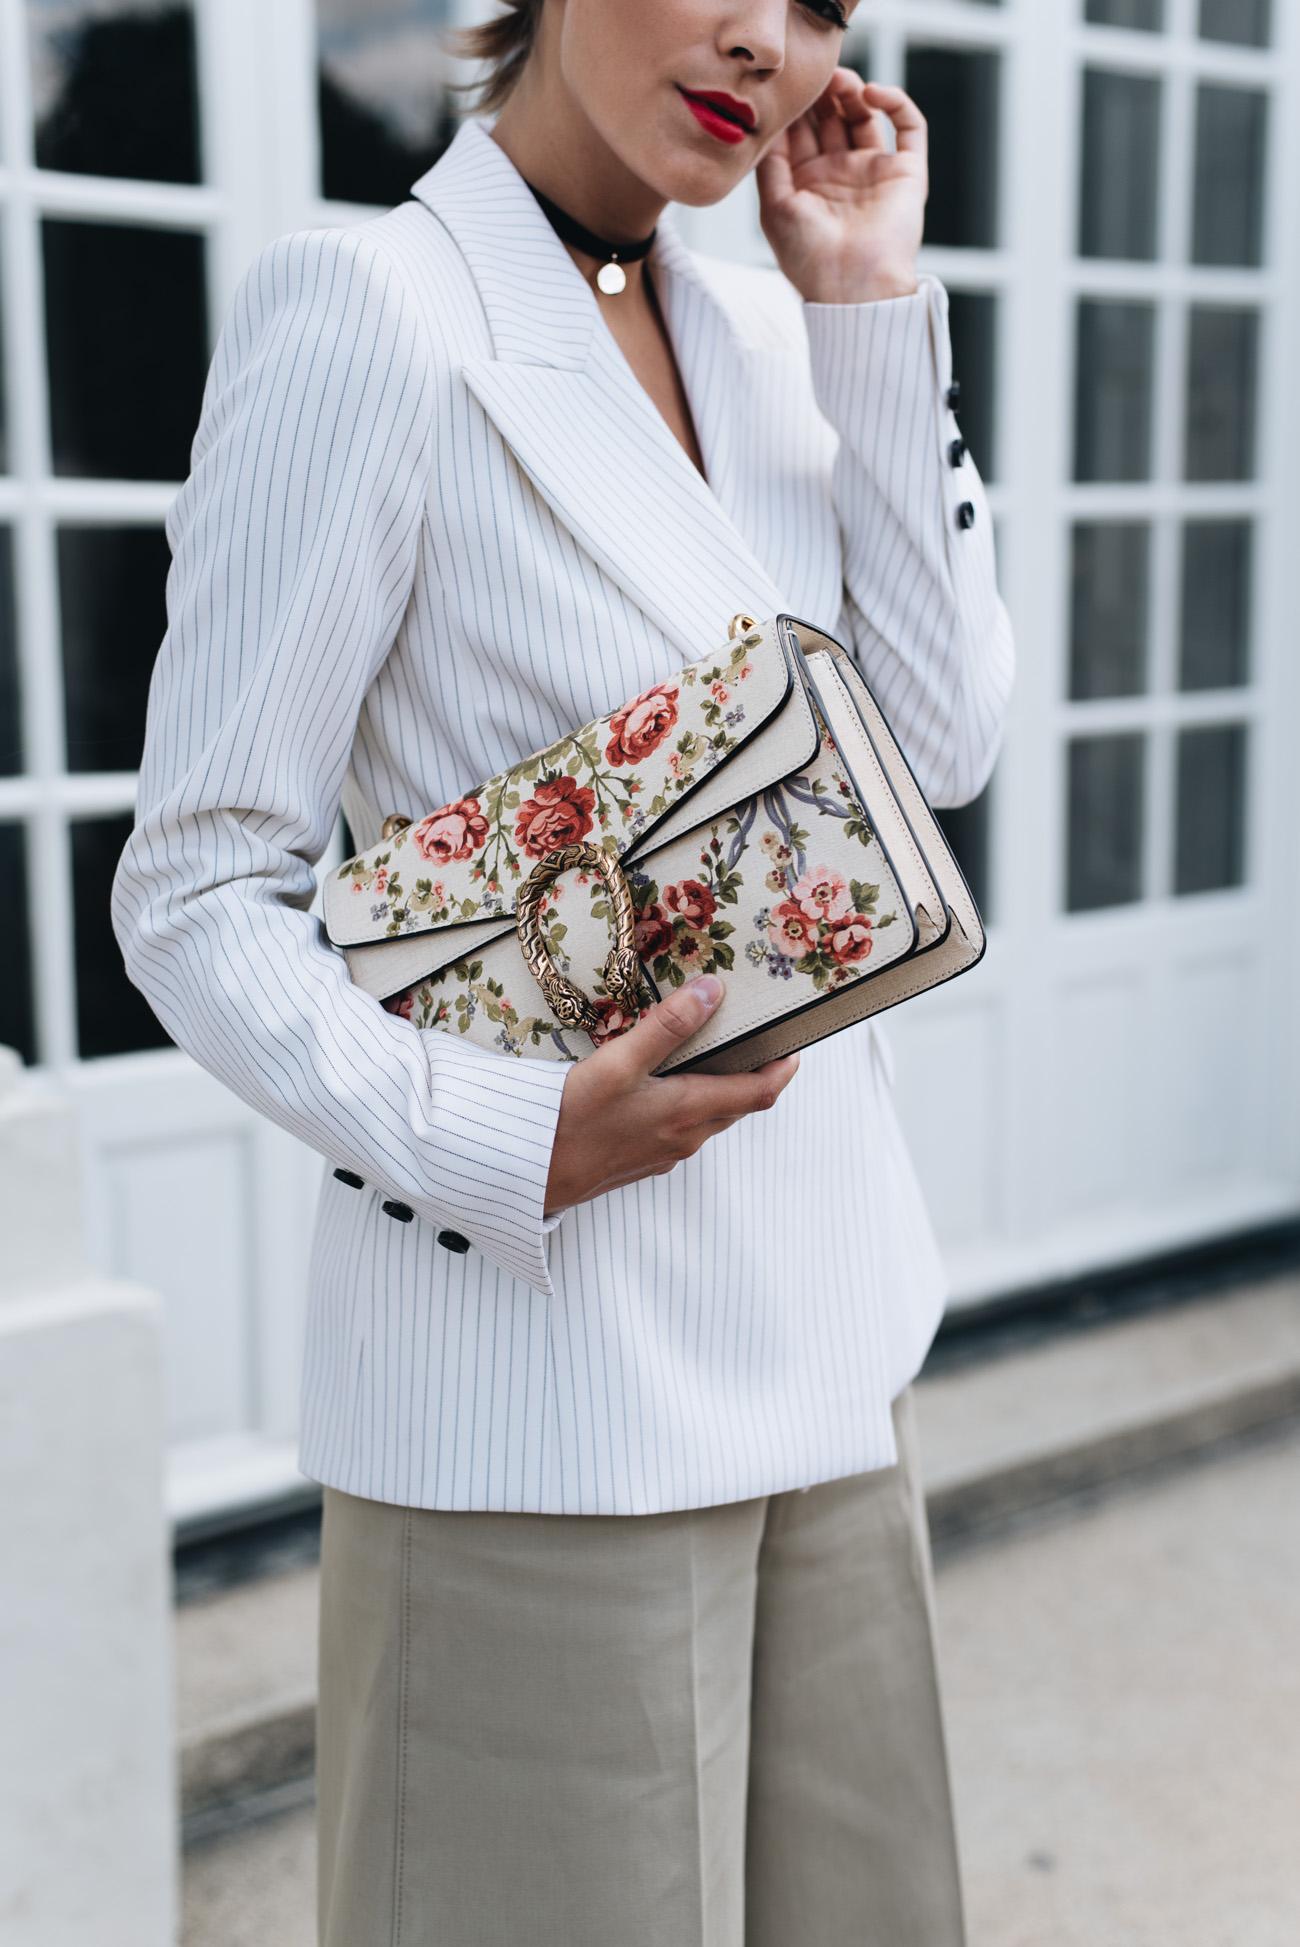 Gucci-for-Net-a-Porter-Floral-Dionysus-Bag-blumen-print-limited-edition-culotte-sequin-details-samt-pumps-dolce-&gabbana-fashiioncarpet